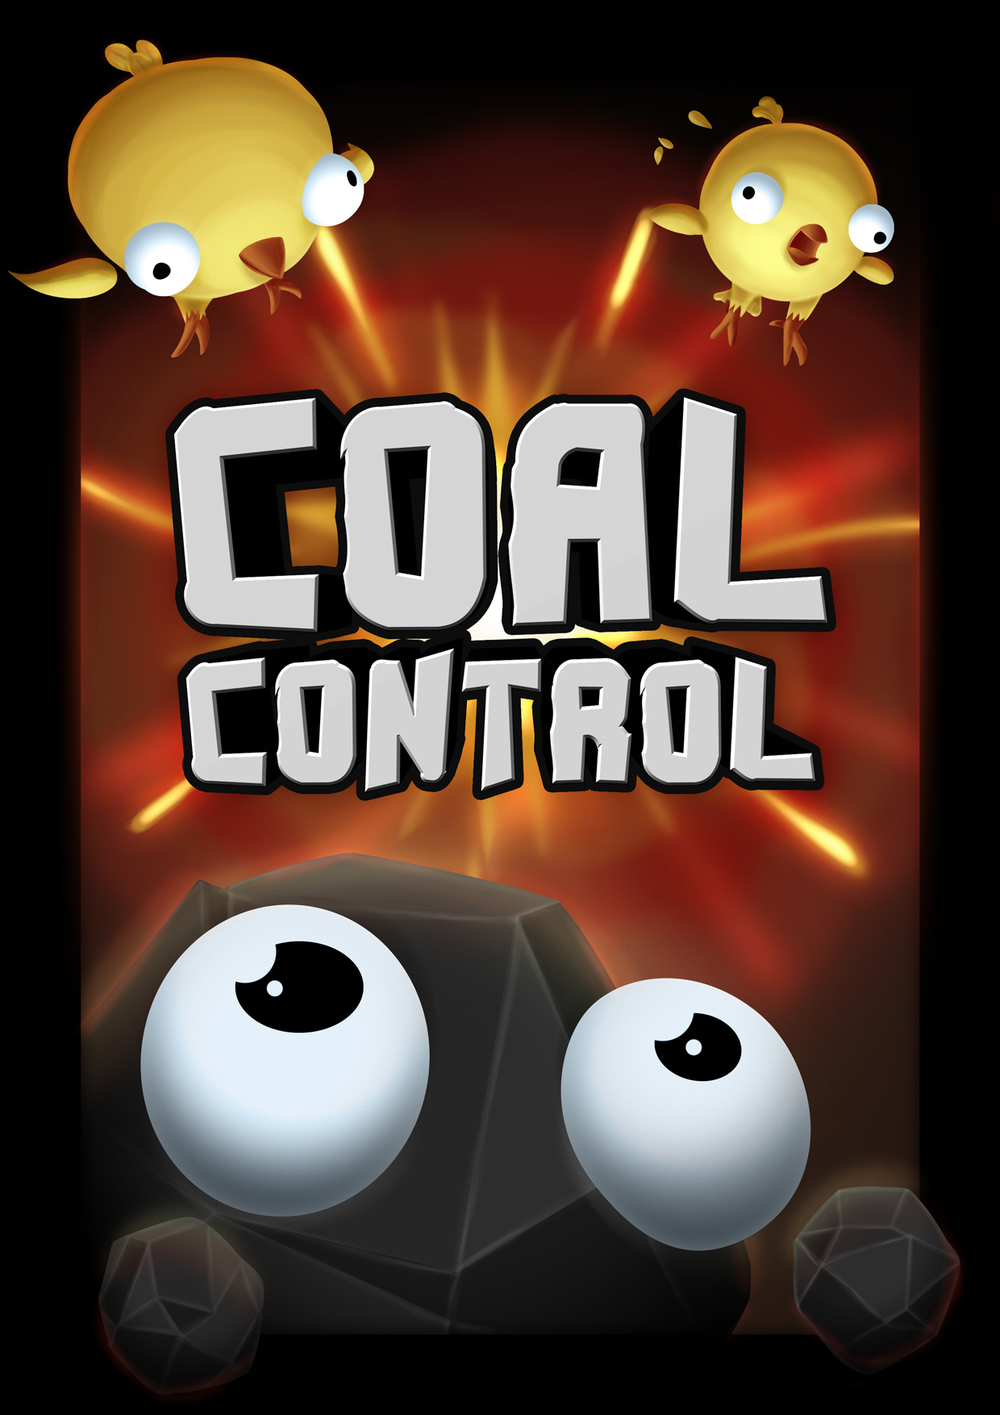 CoalControlPoster